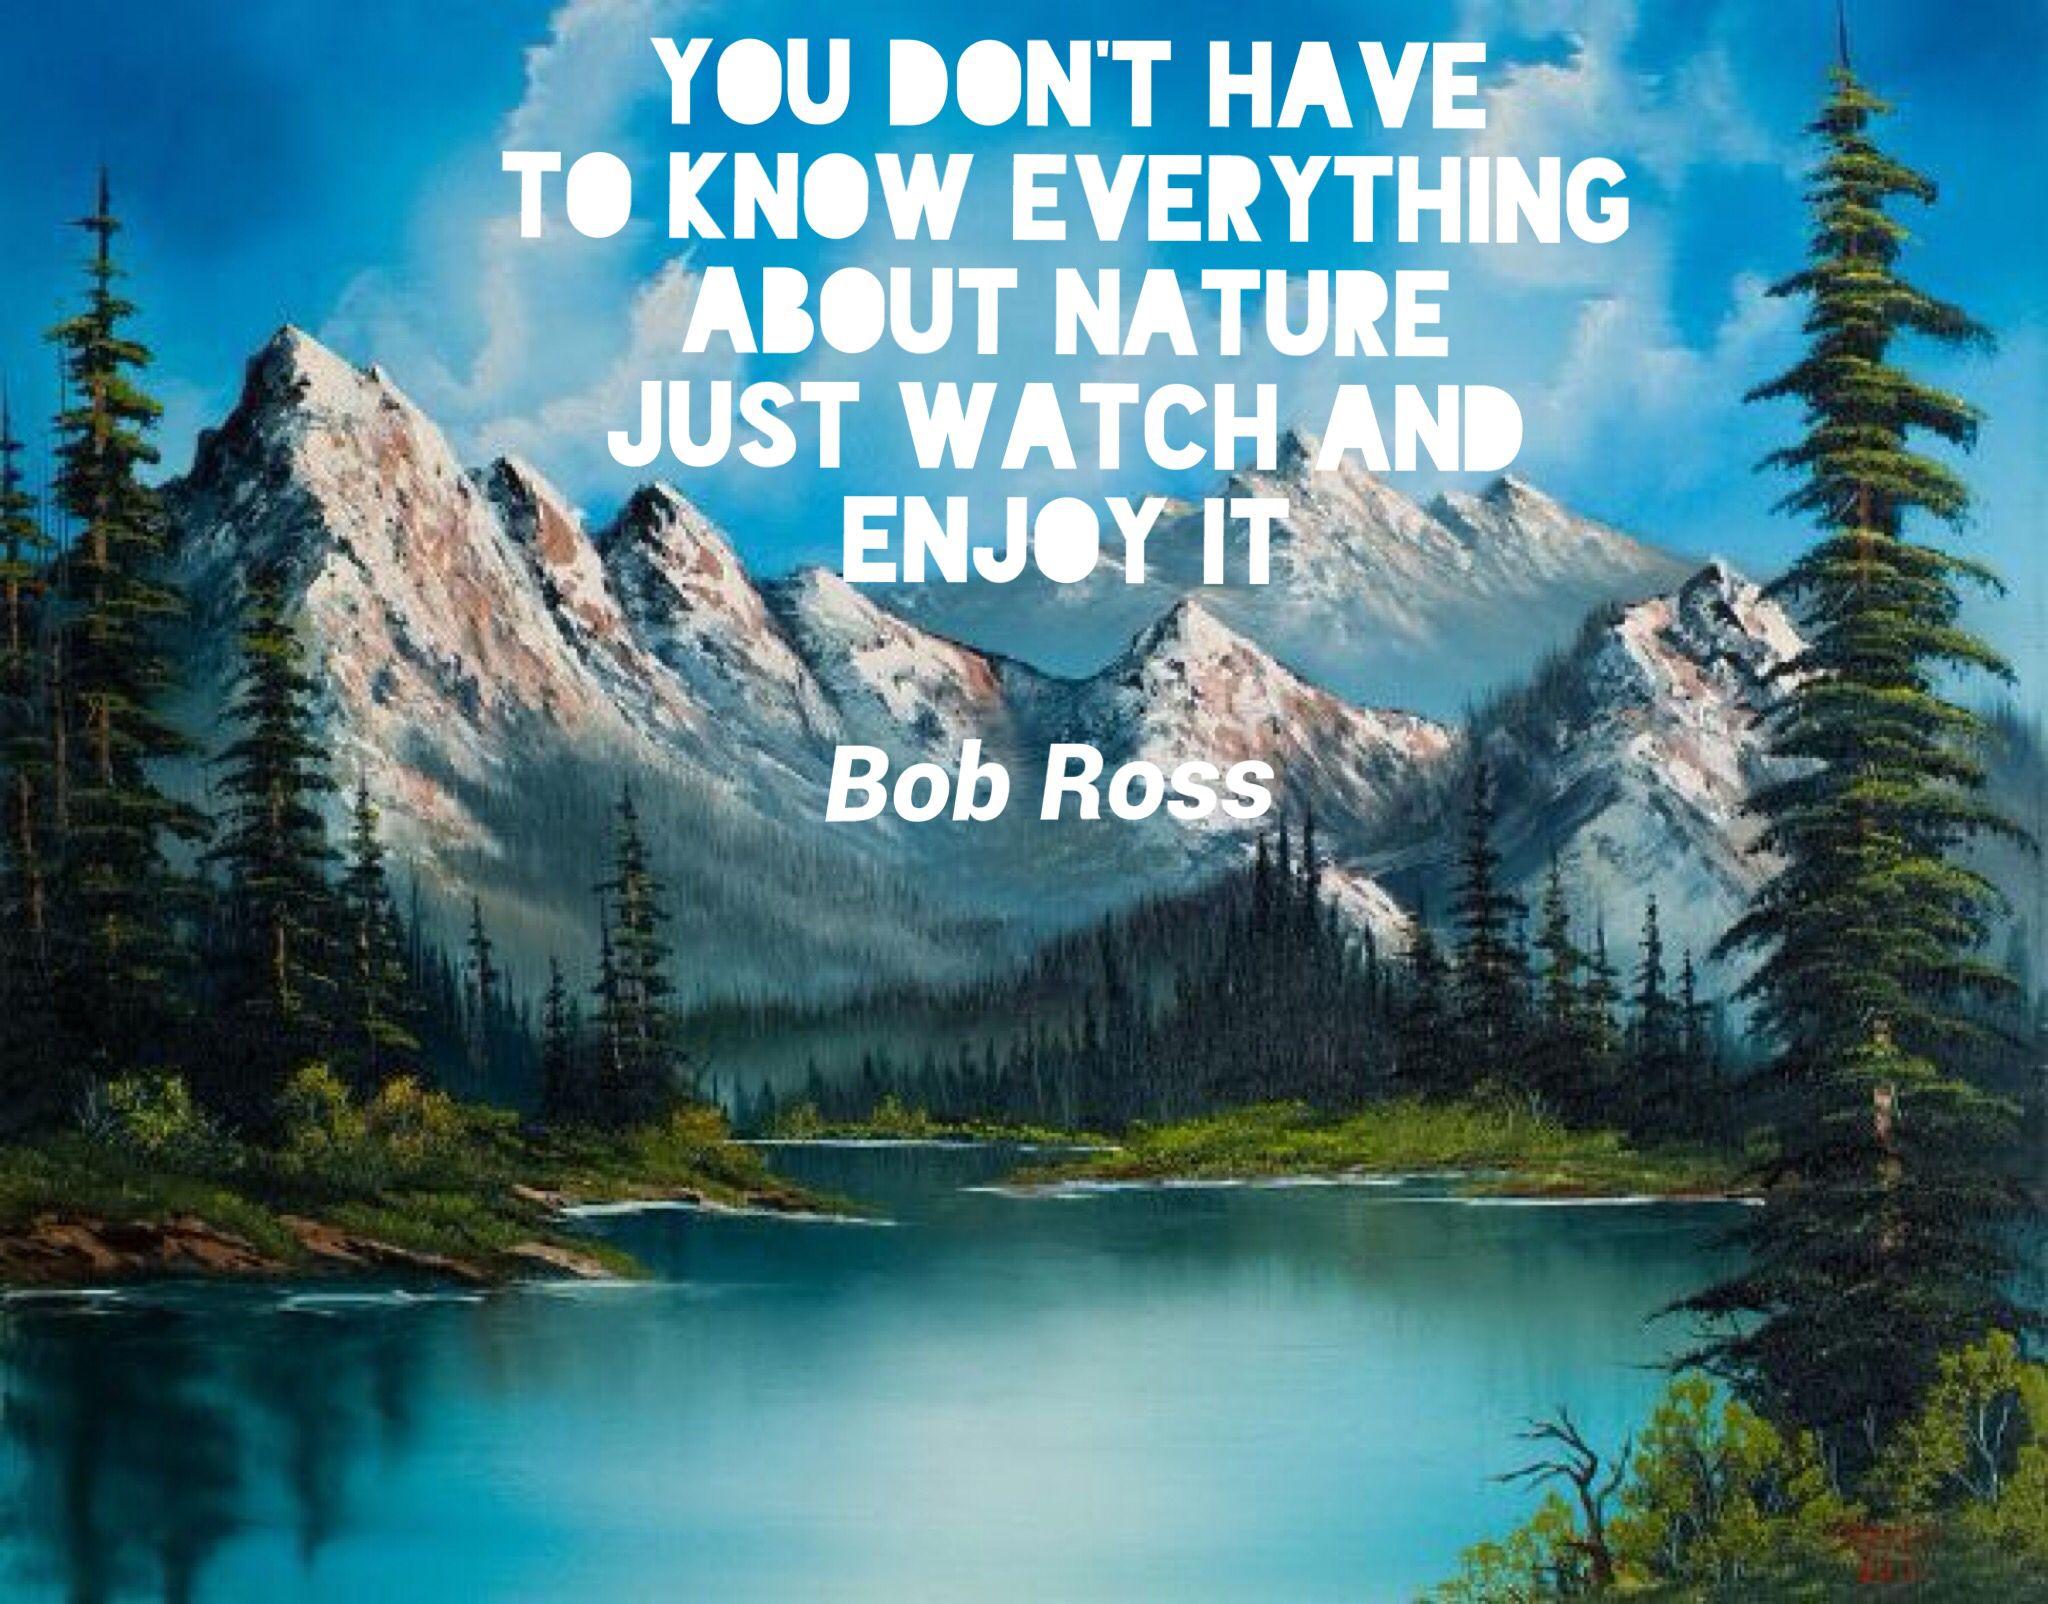 Bob Ross Quotes Inspirational Quotes Mountain Paintings Landscape Paintings Landscape Art